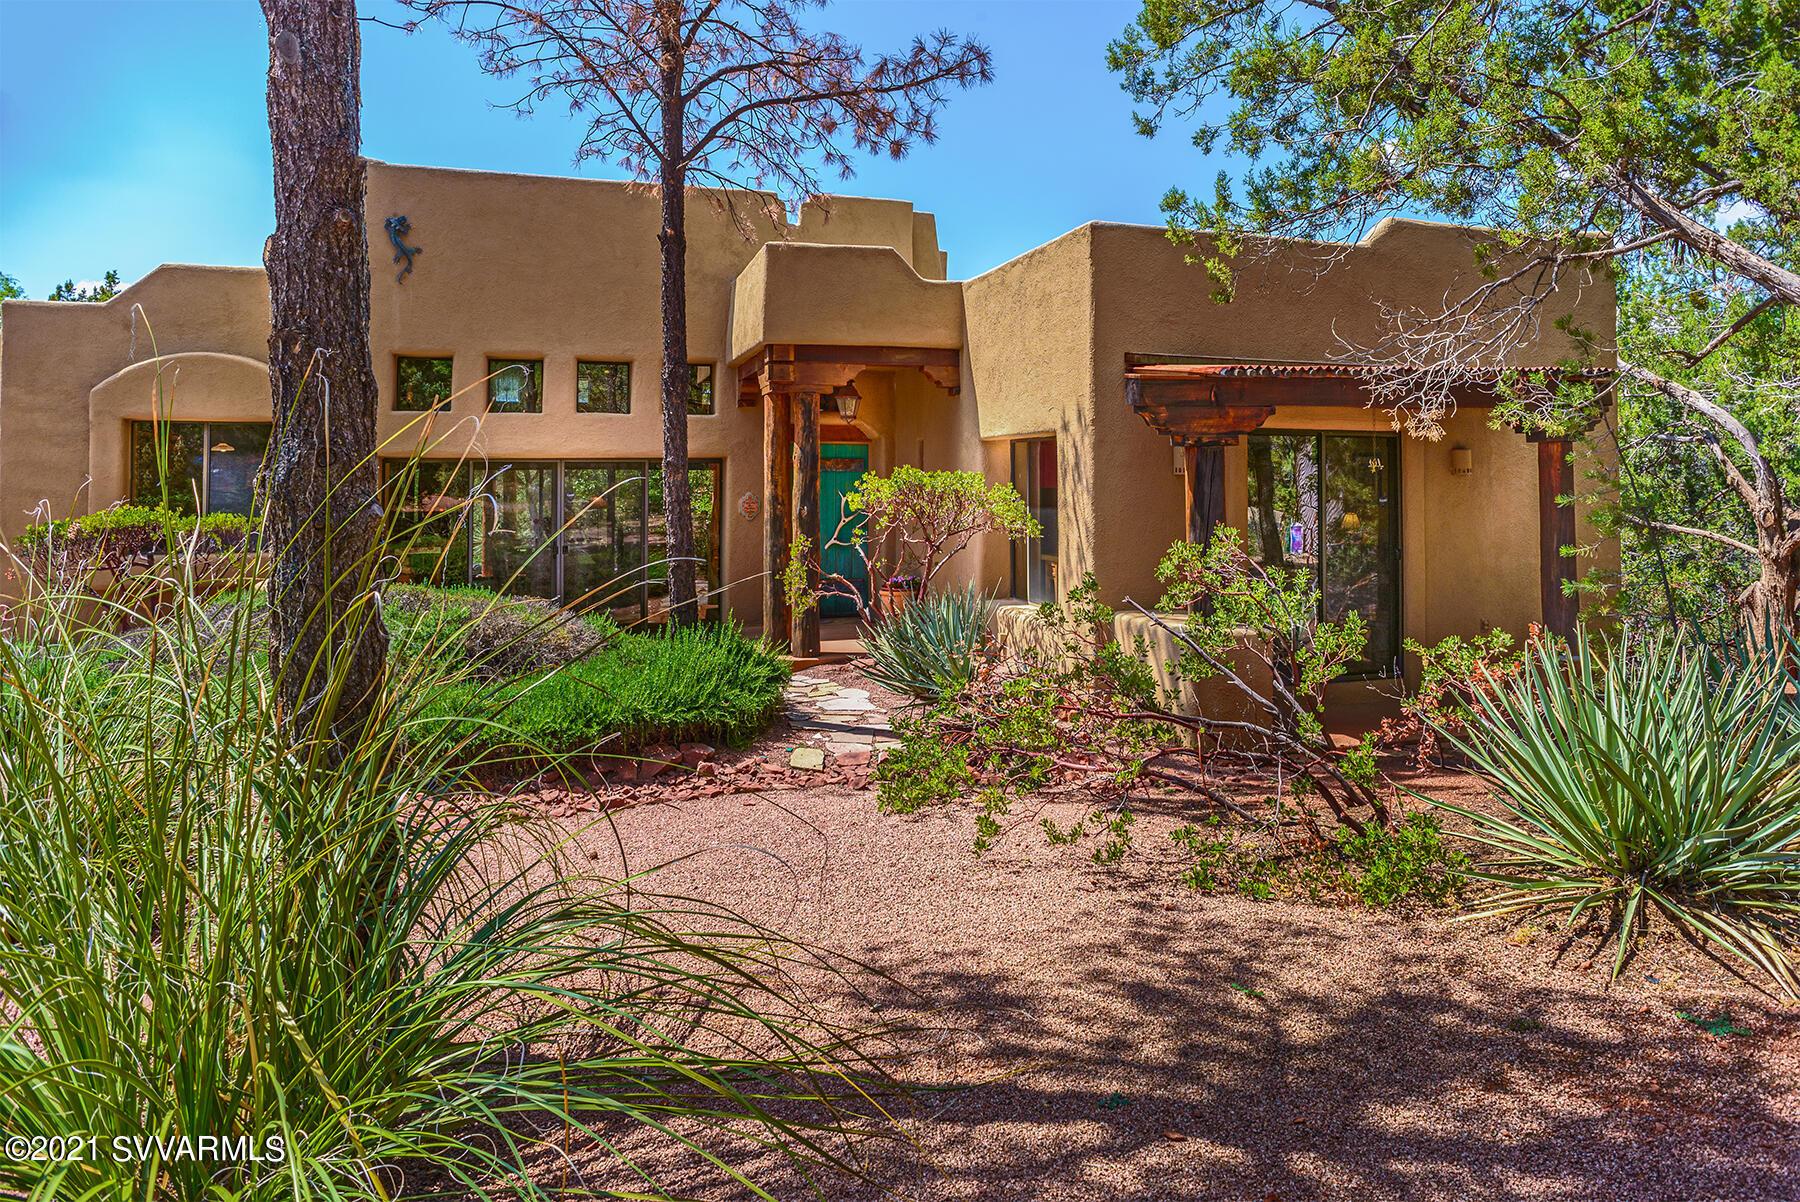 91 Cathedral Lane Sedona, AZ 86336